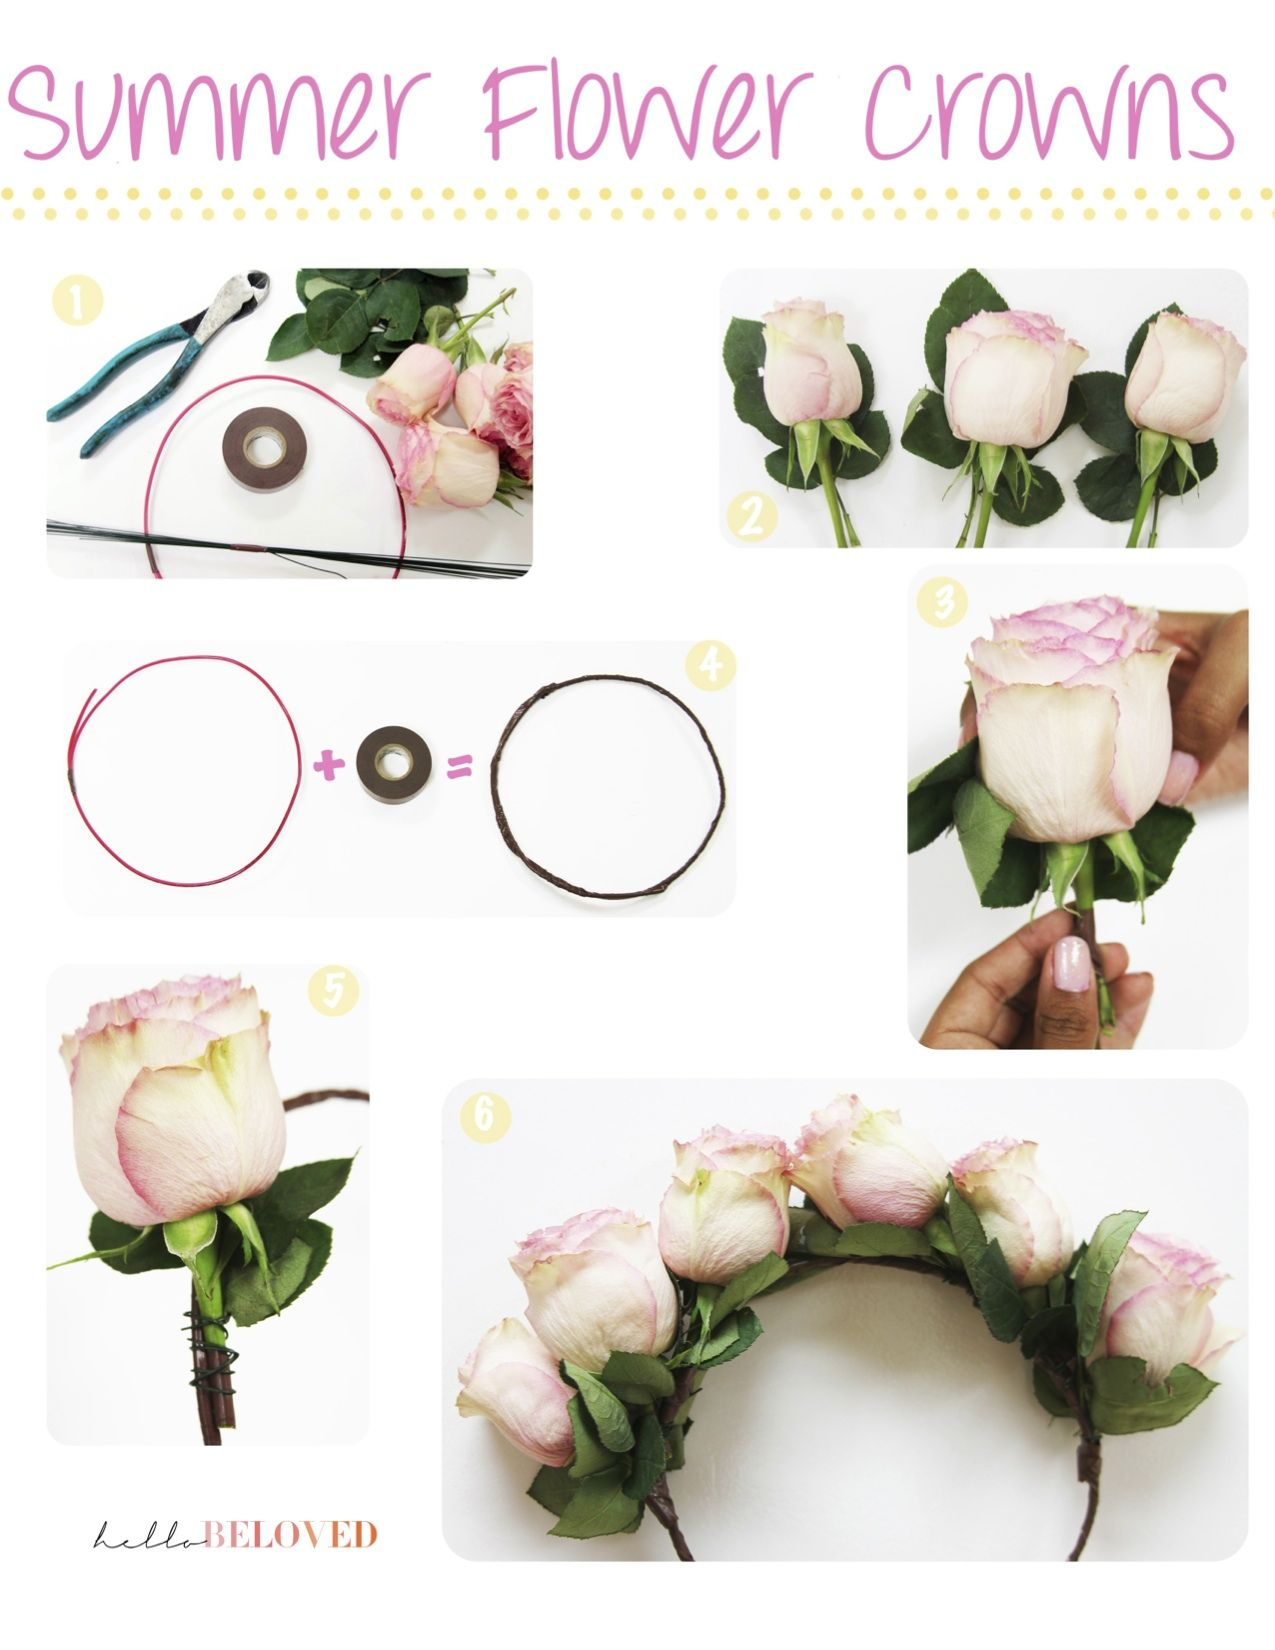 Flower crownsg 12751650 pride pinterest pride flower crownsg 12751650 izmirmasajfo